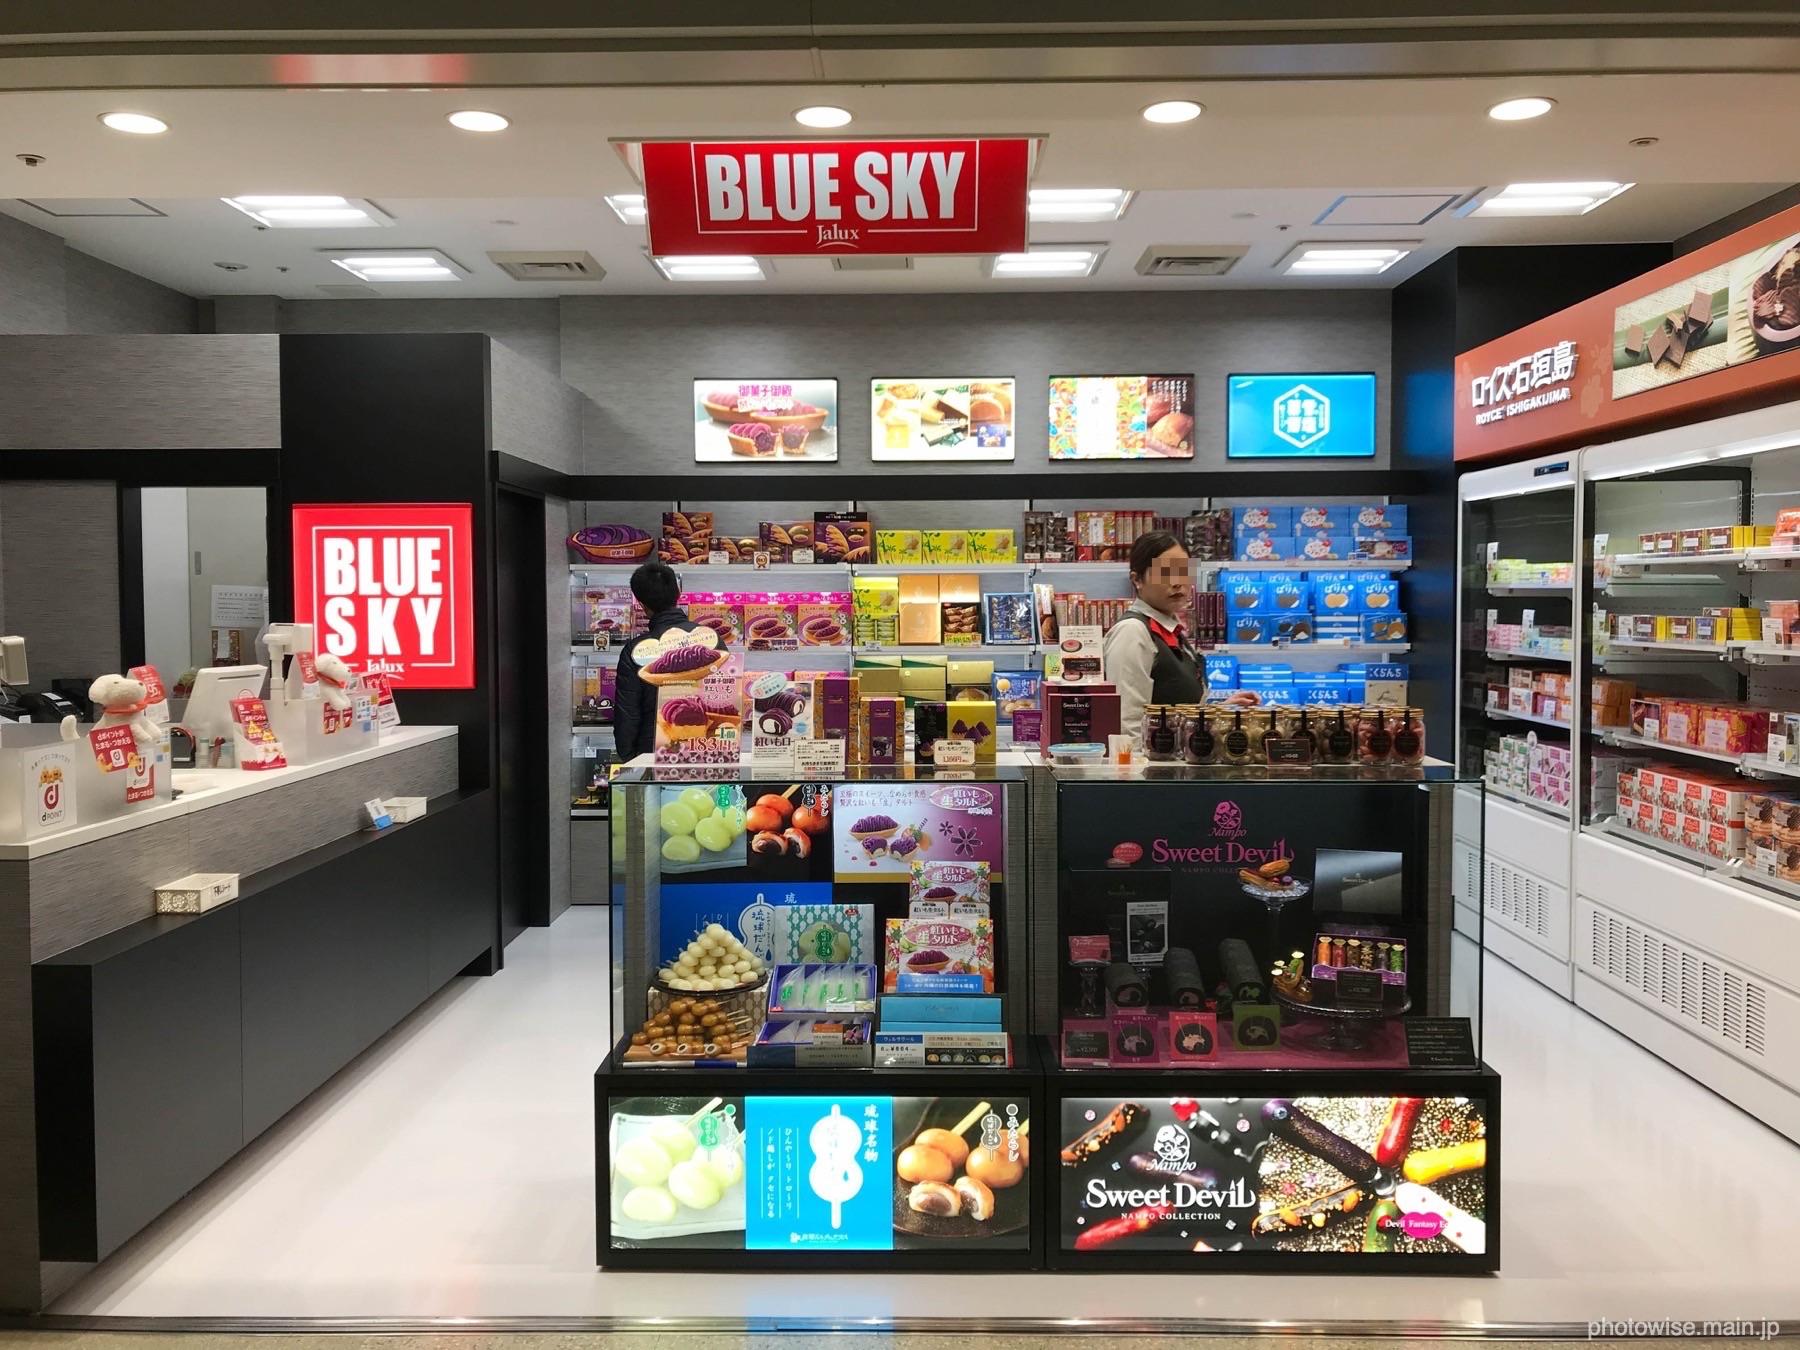 Bluesky那覇空港店